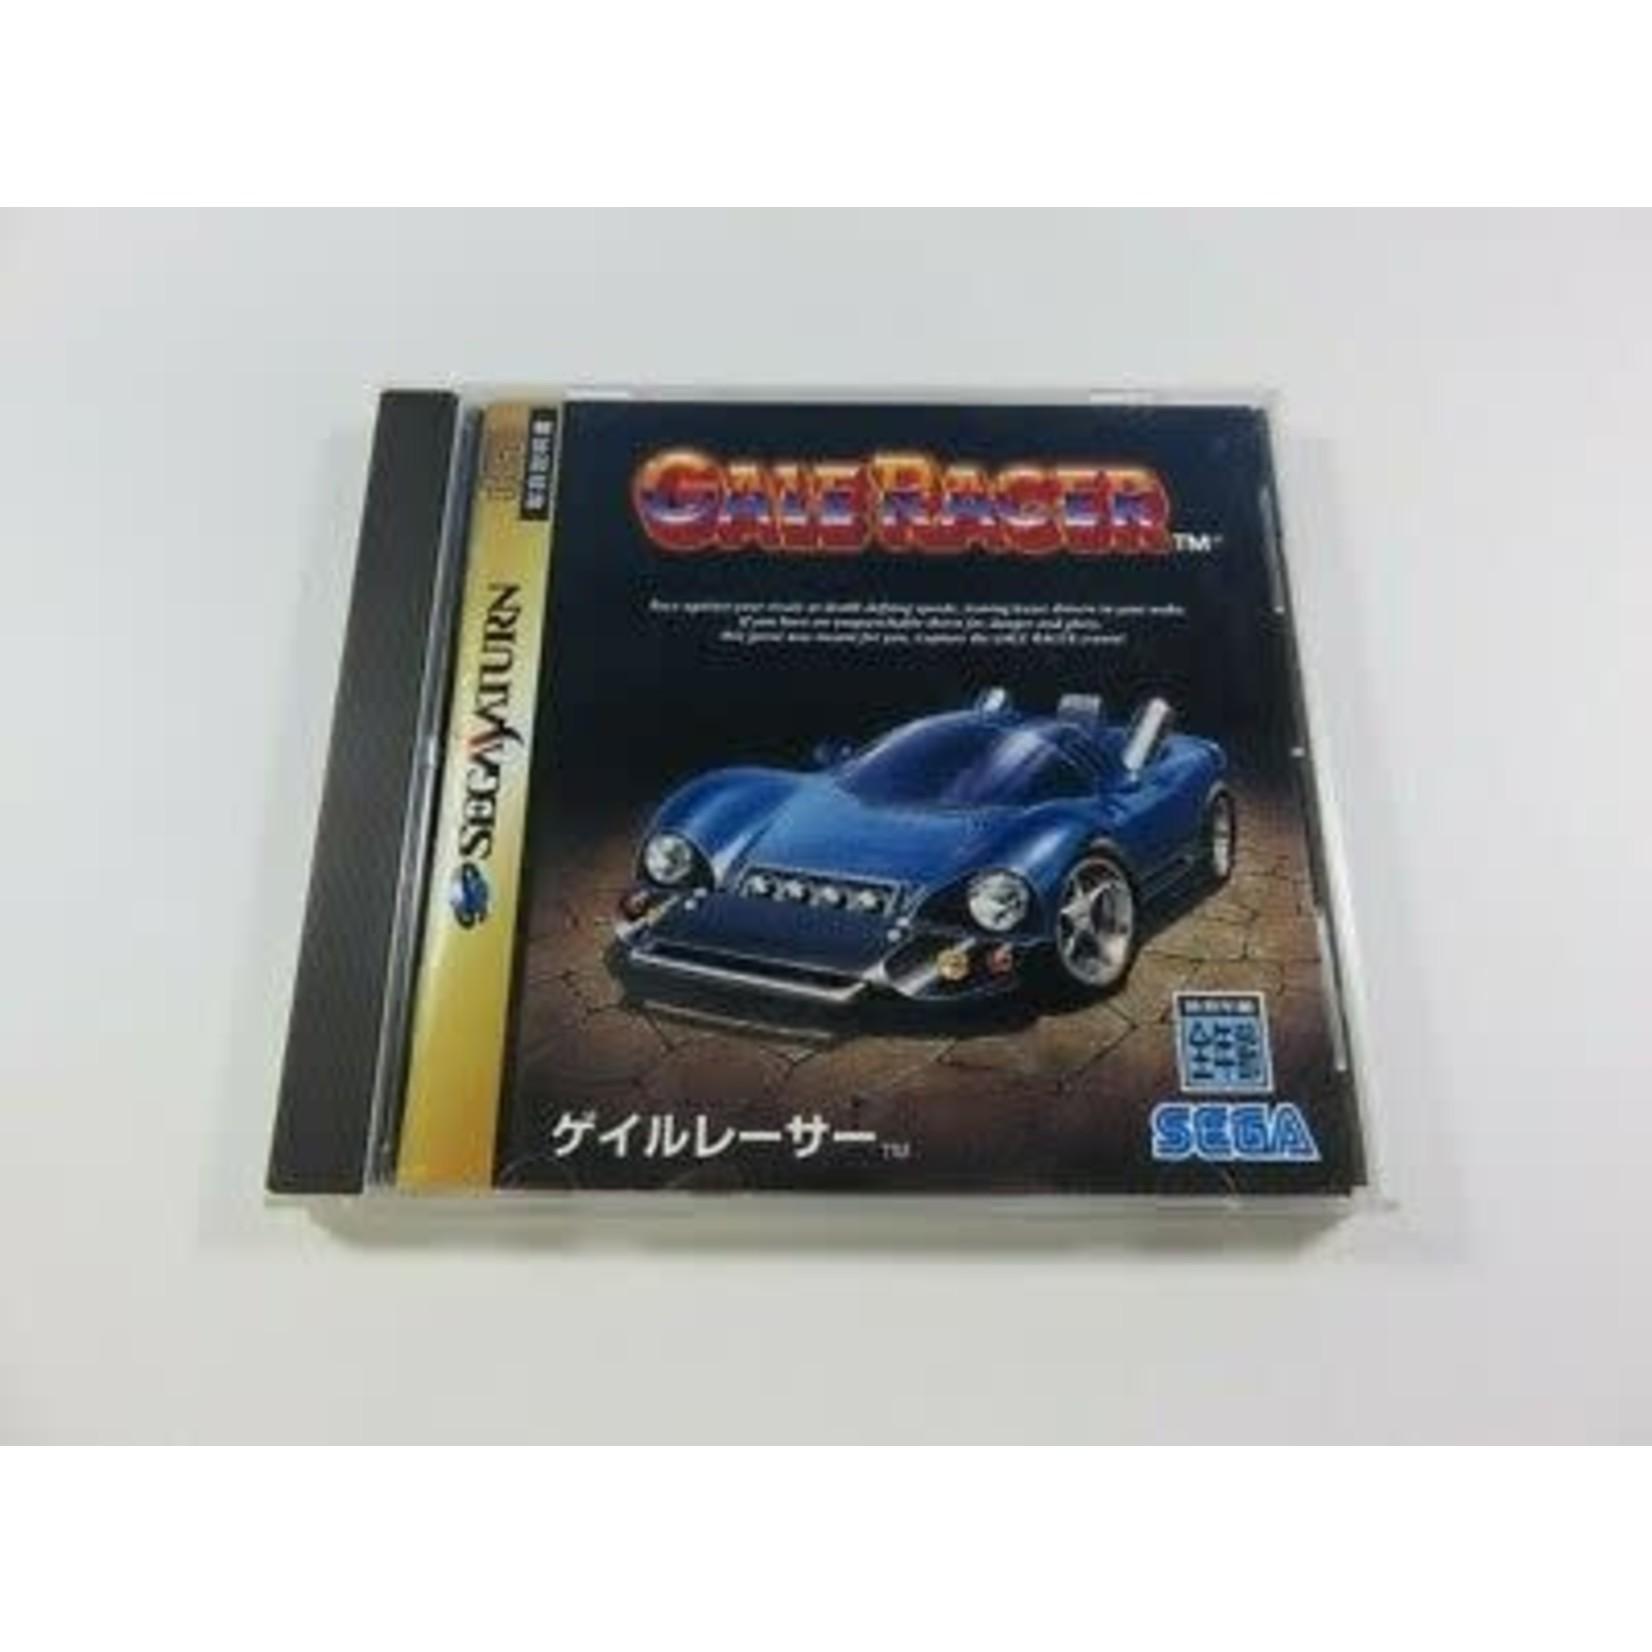 IMPORT-SSU-Gale Racer